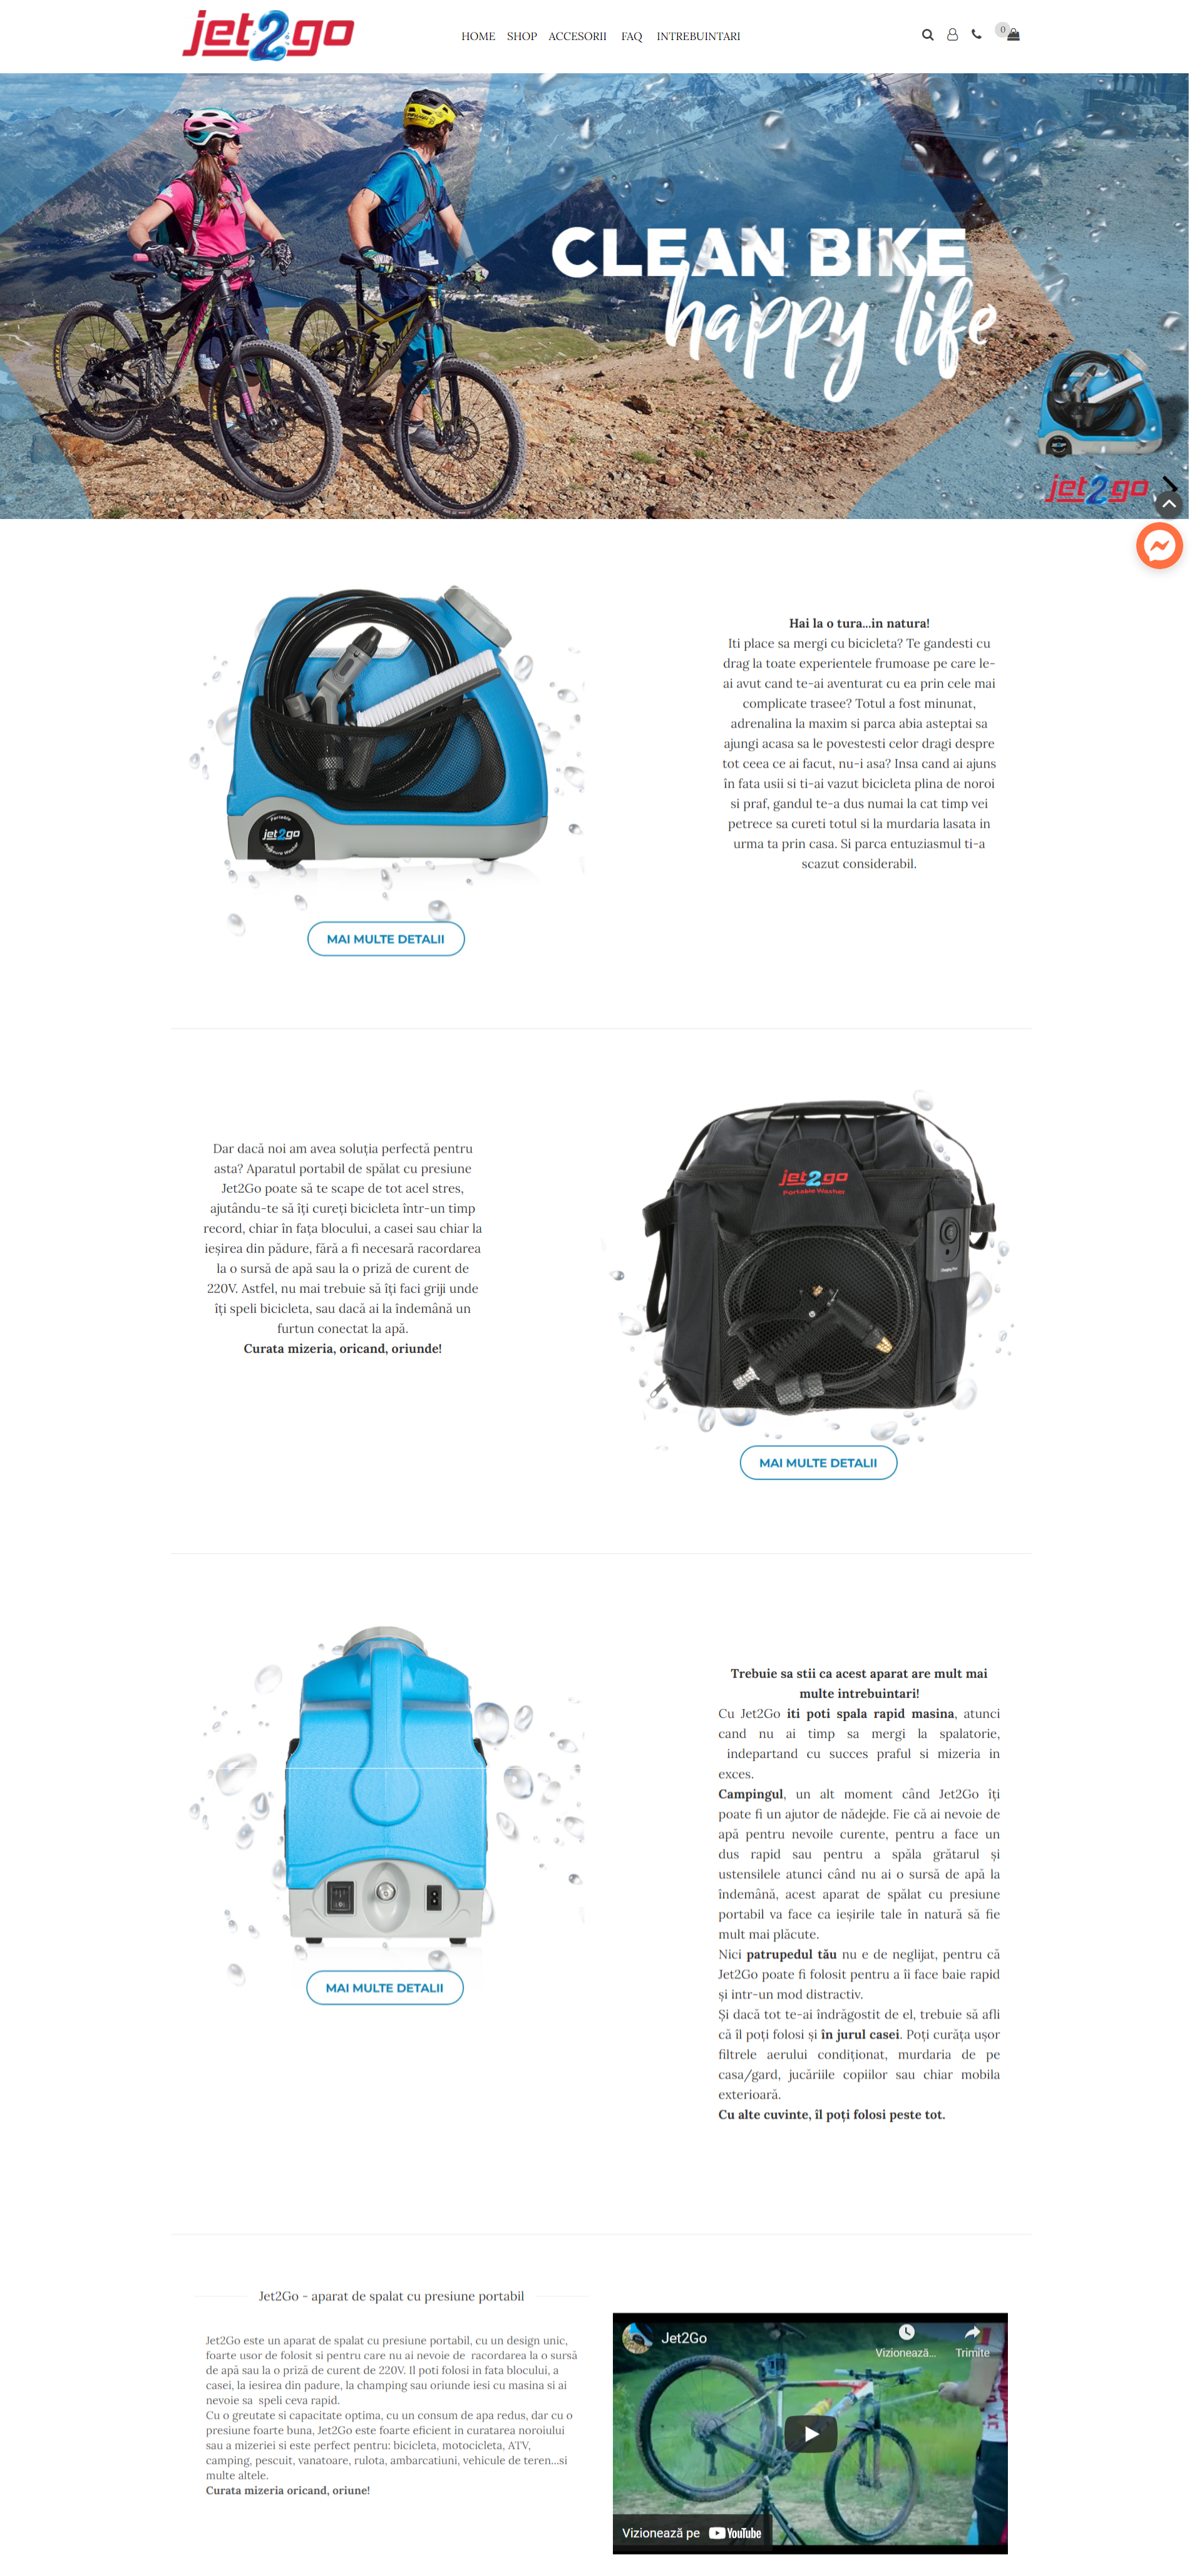 tema-toscana-magazine-online